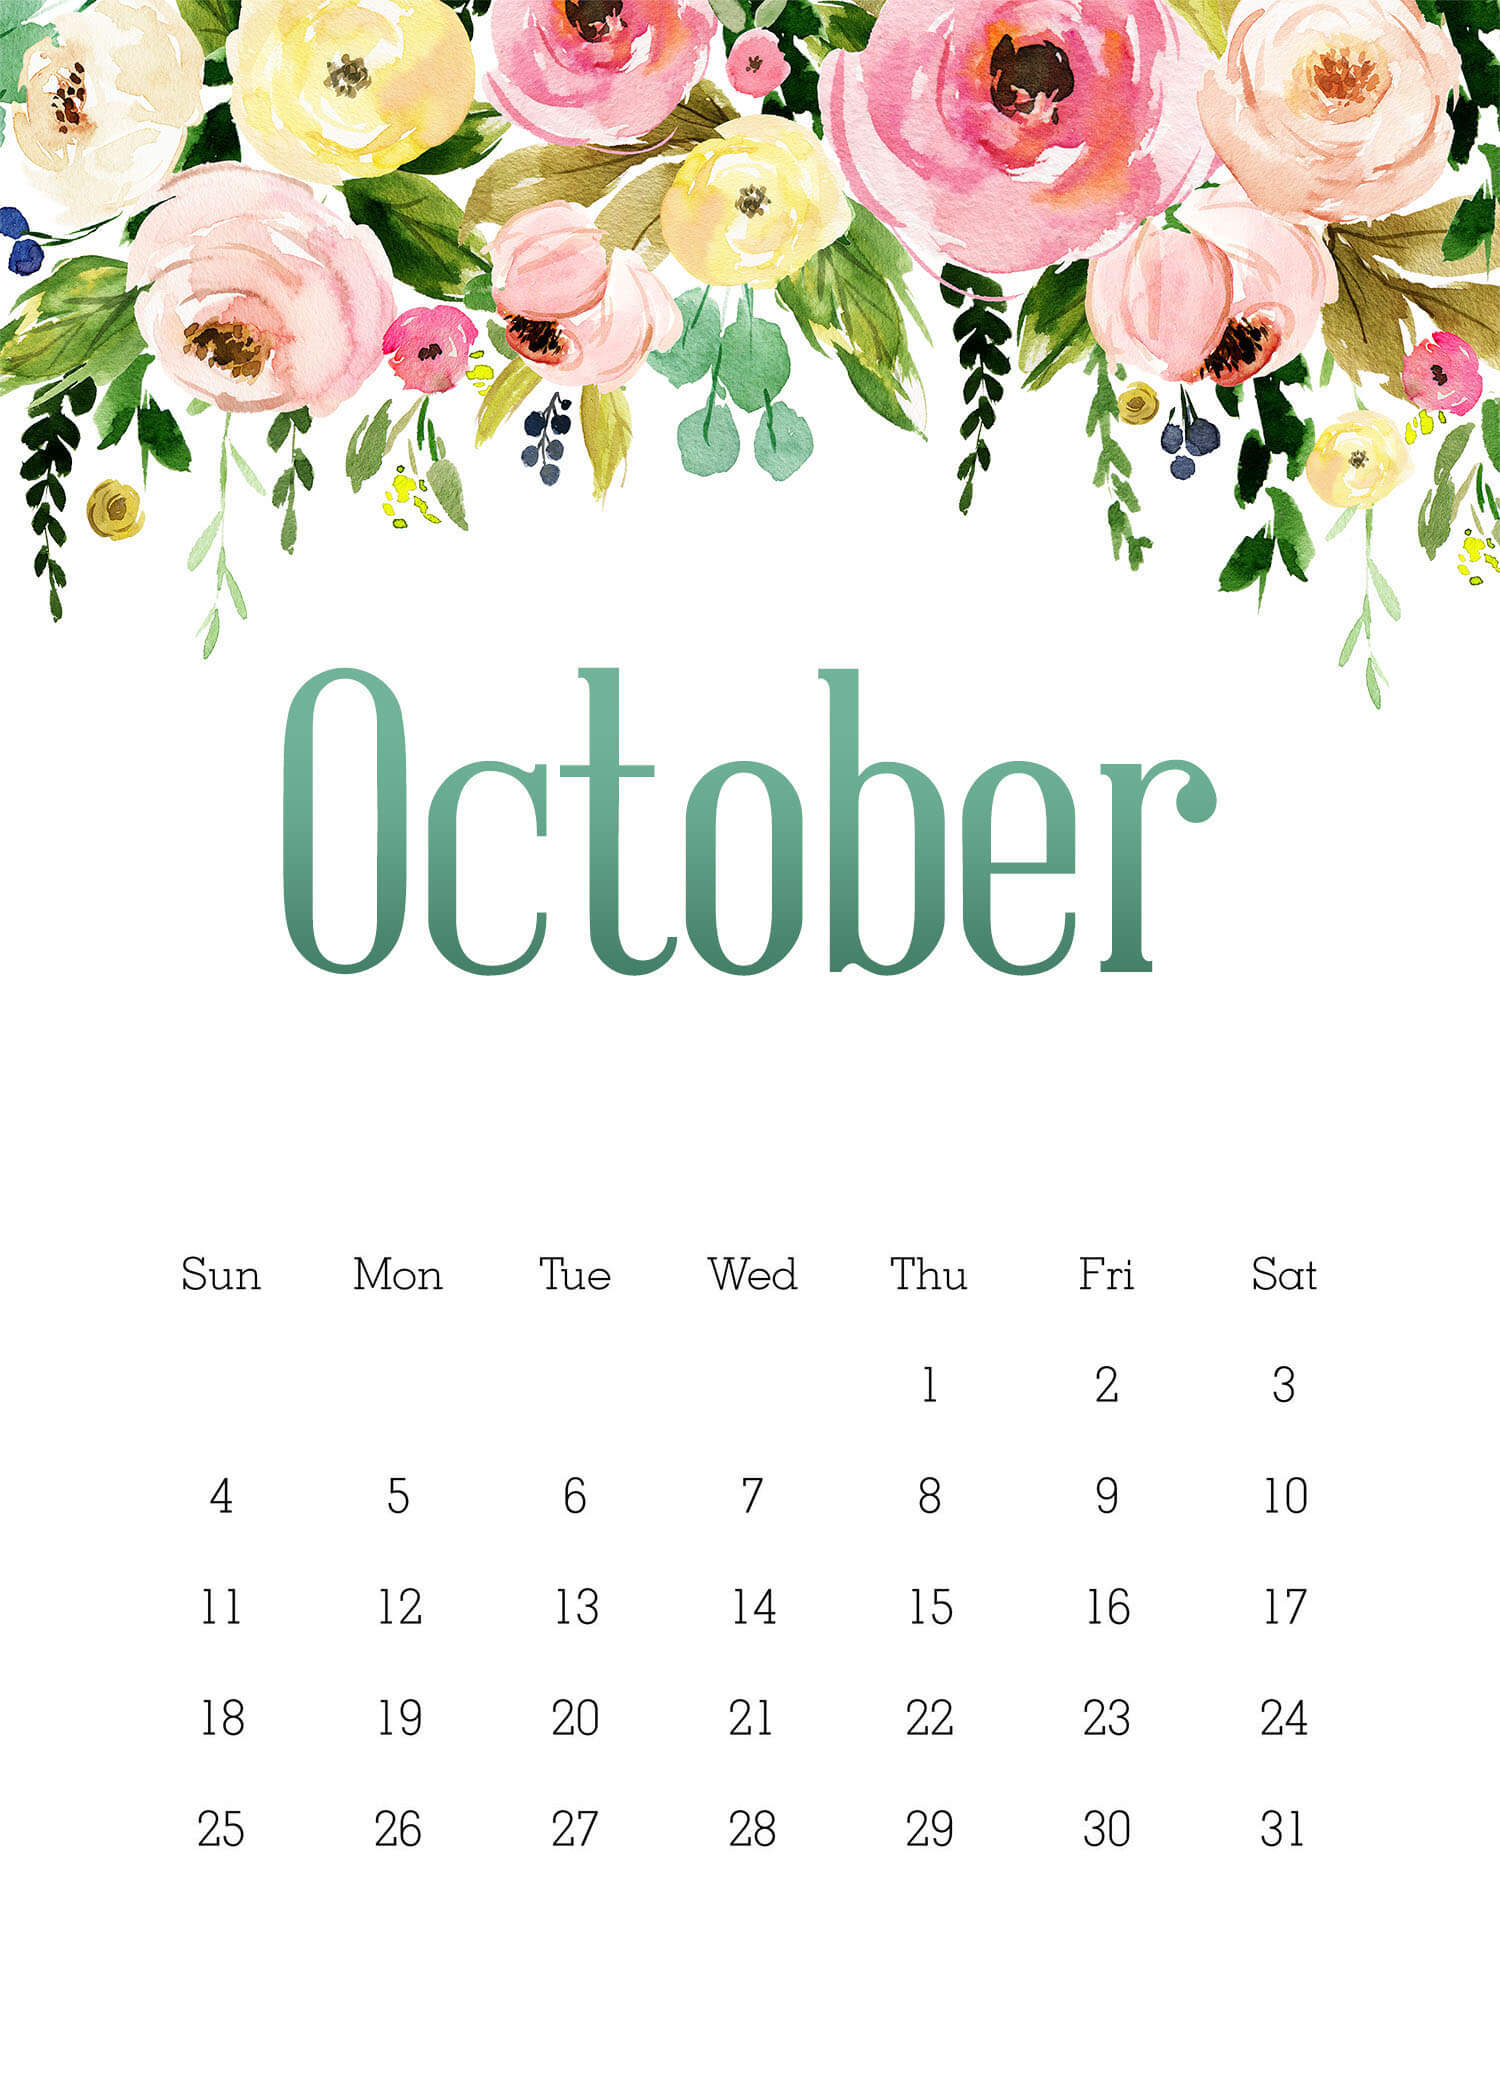 Floral October 2020 Wall Calendar Template